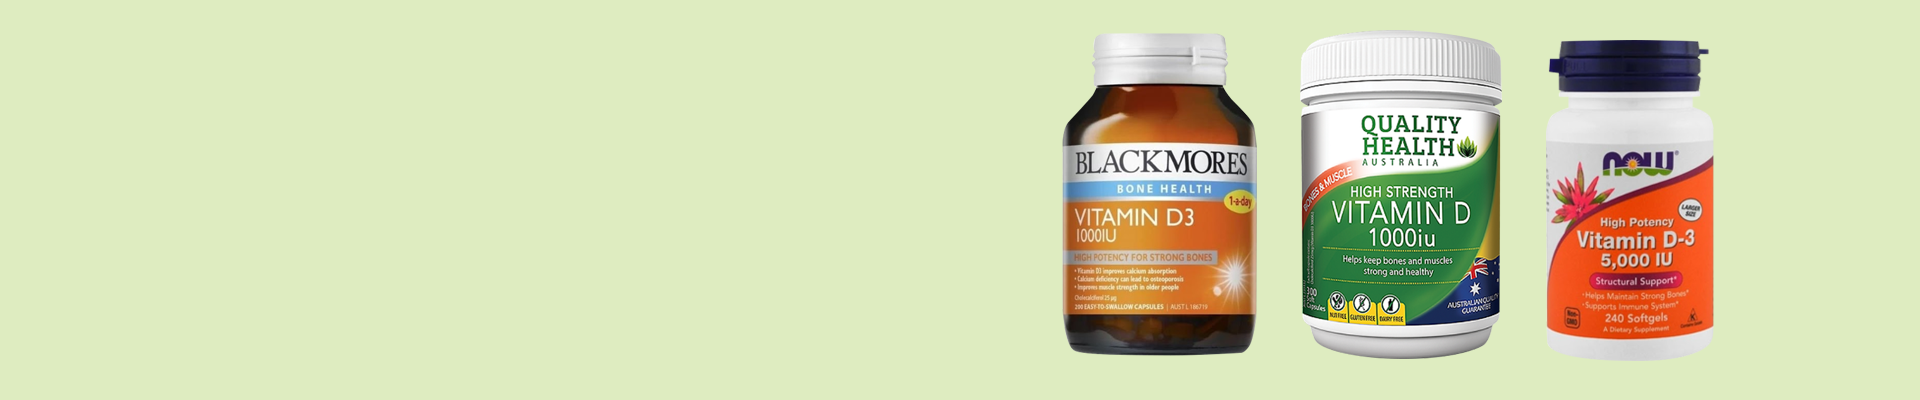 Jual Vitamin D Online - Multivitamin Terlengkap